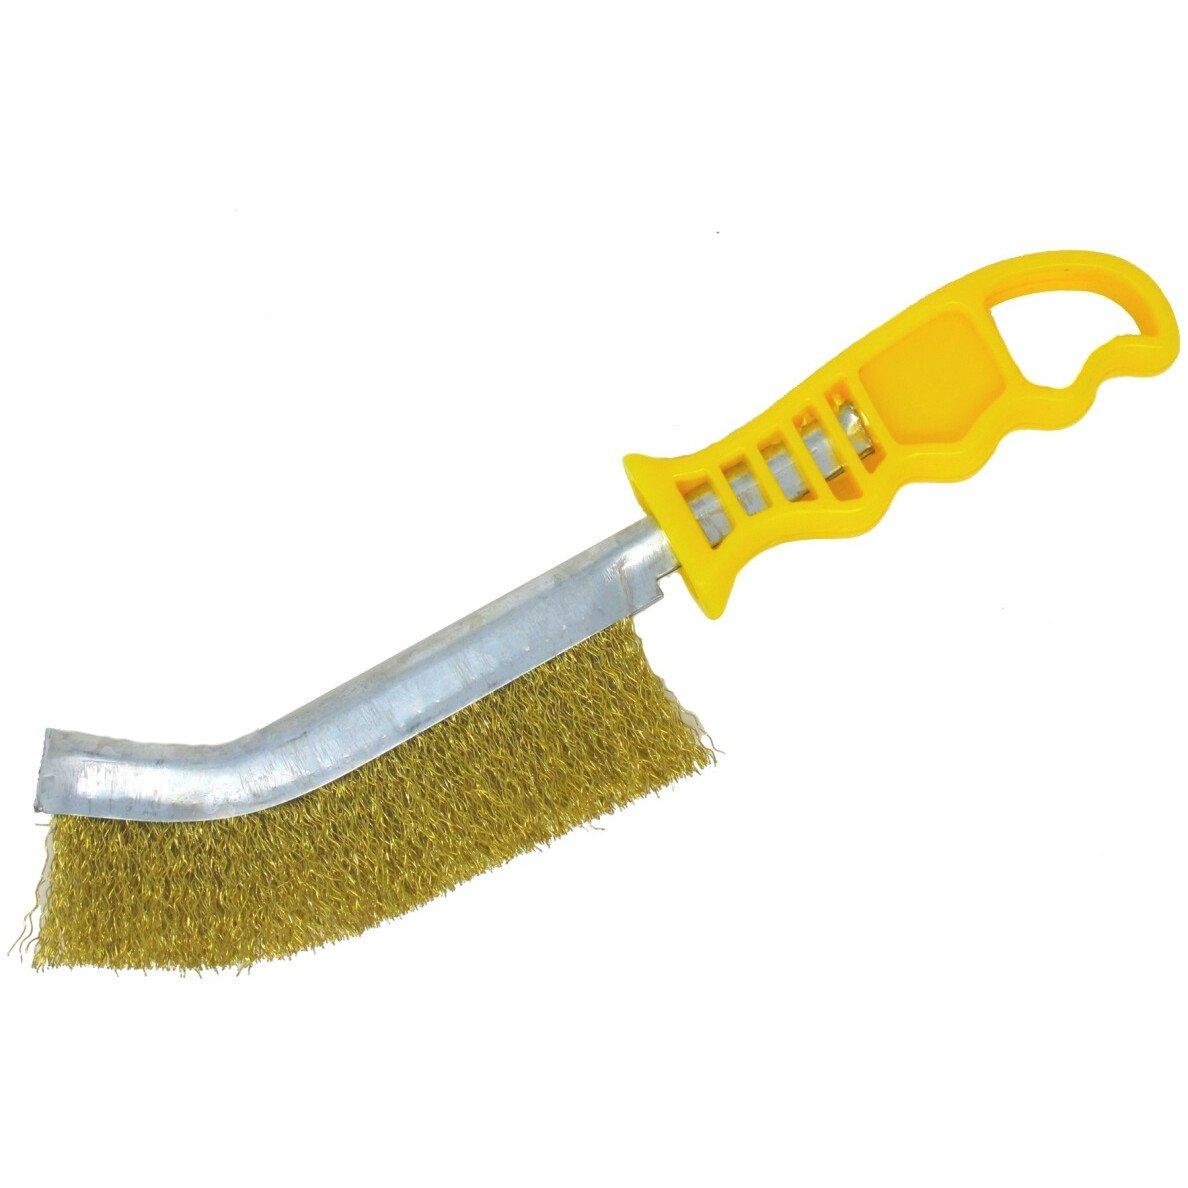 Osborn 0008462591 Wire Brush (Brass) Yellow Handled